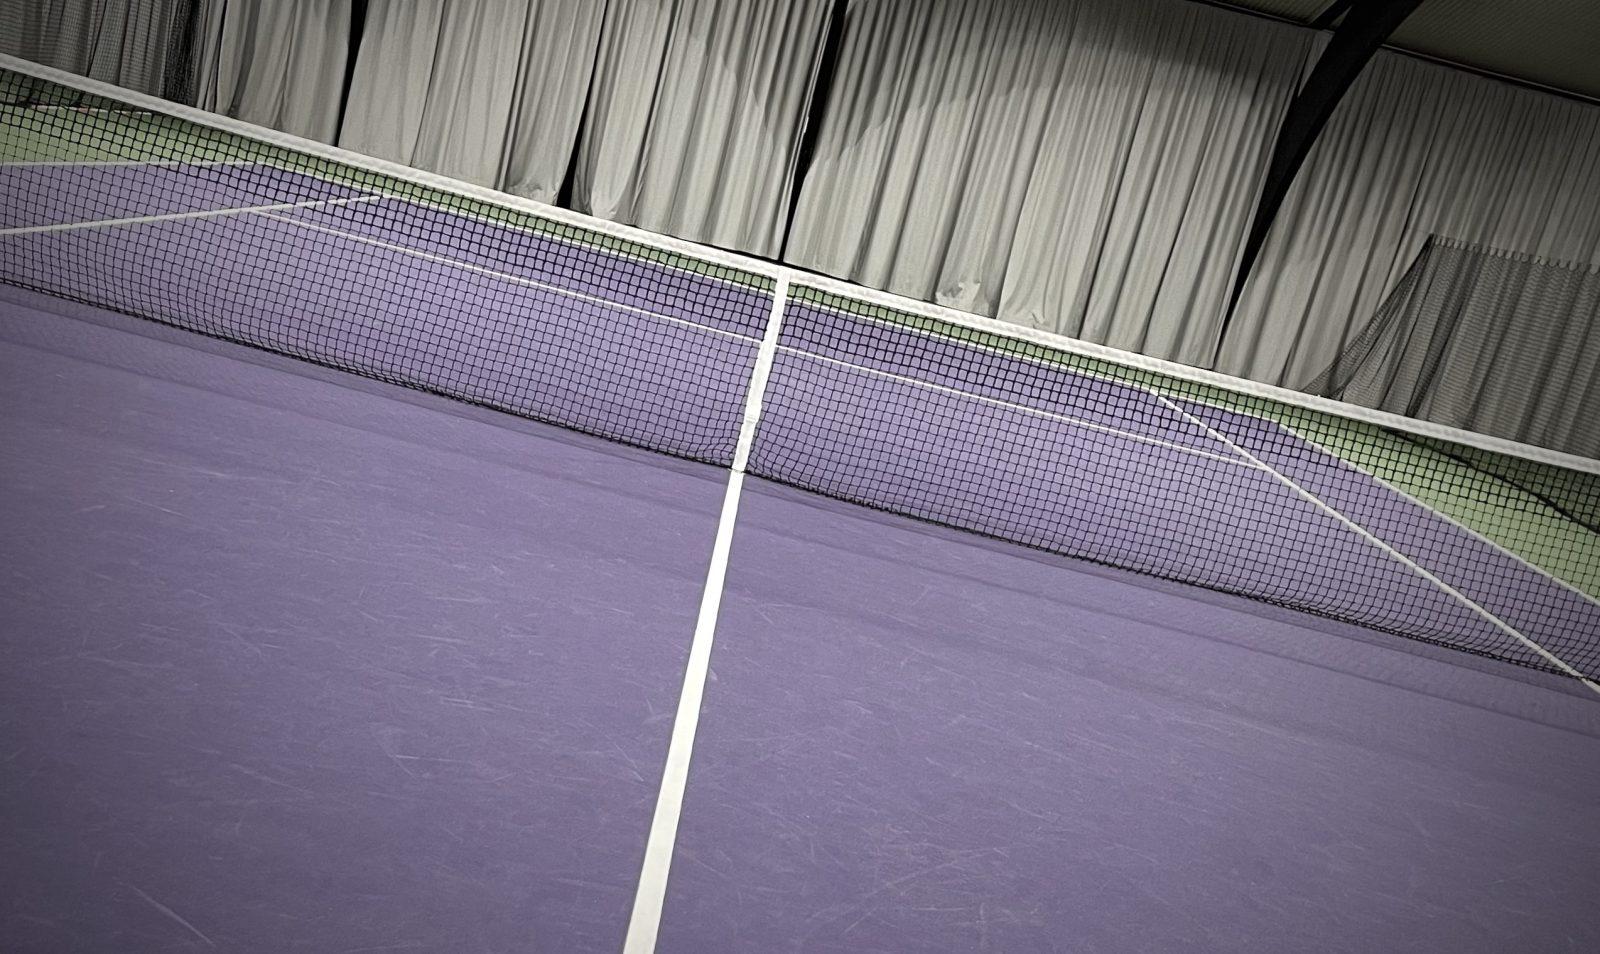 Tennishalle Goellner